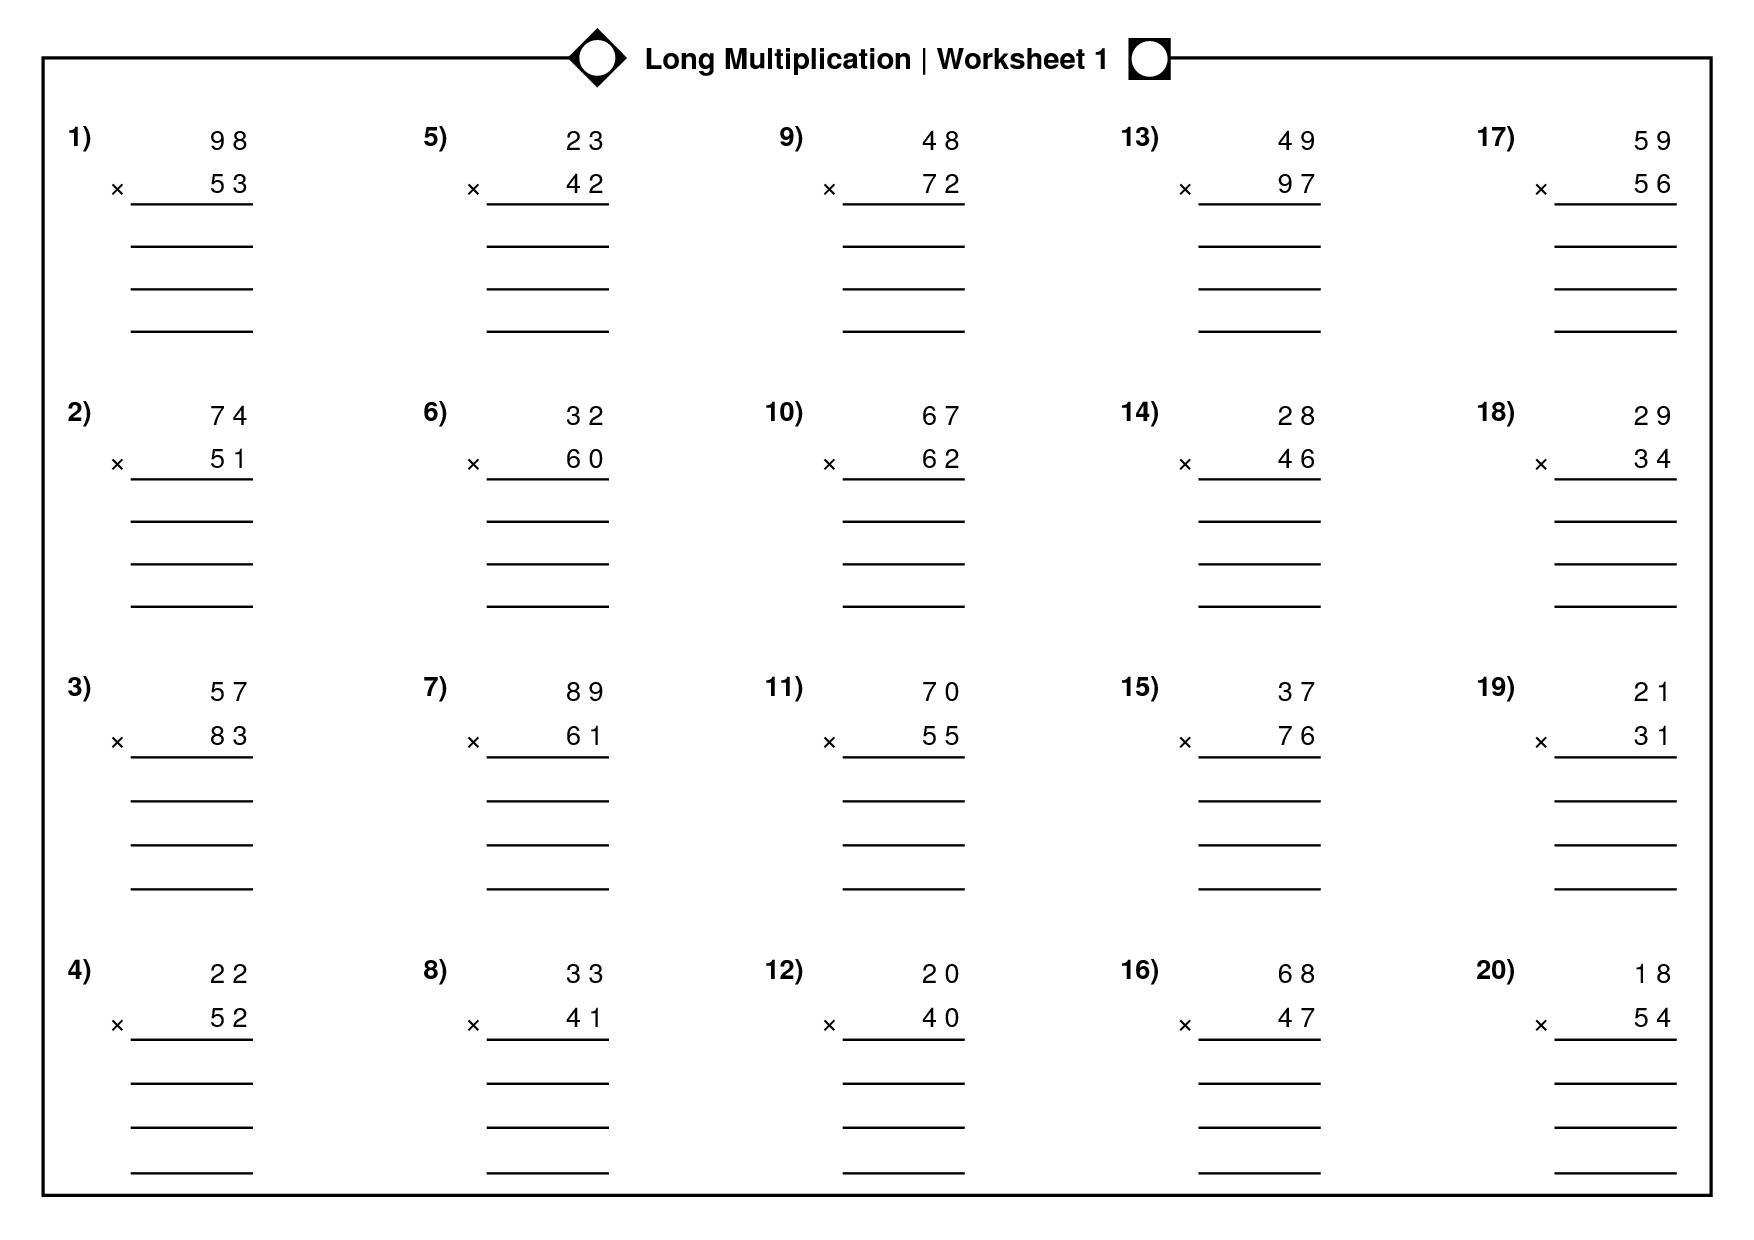 Multiplication Worksheet For Class 5 Cbse